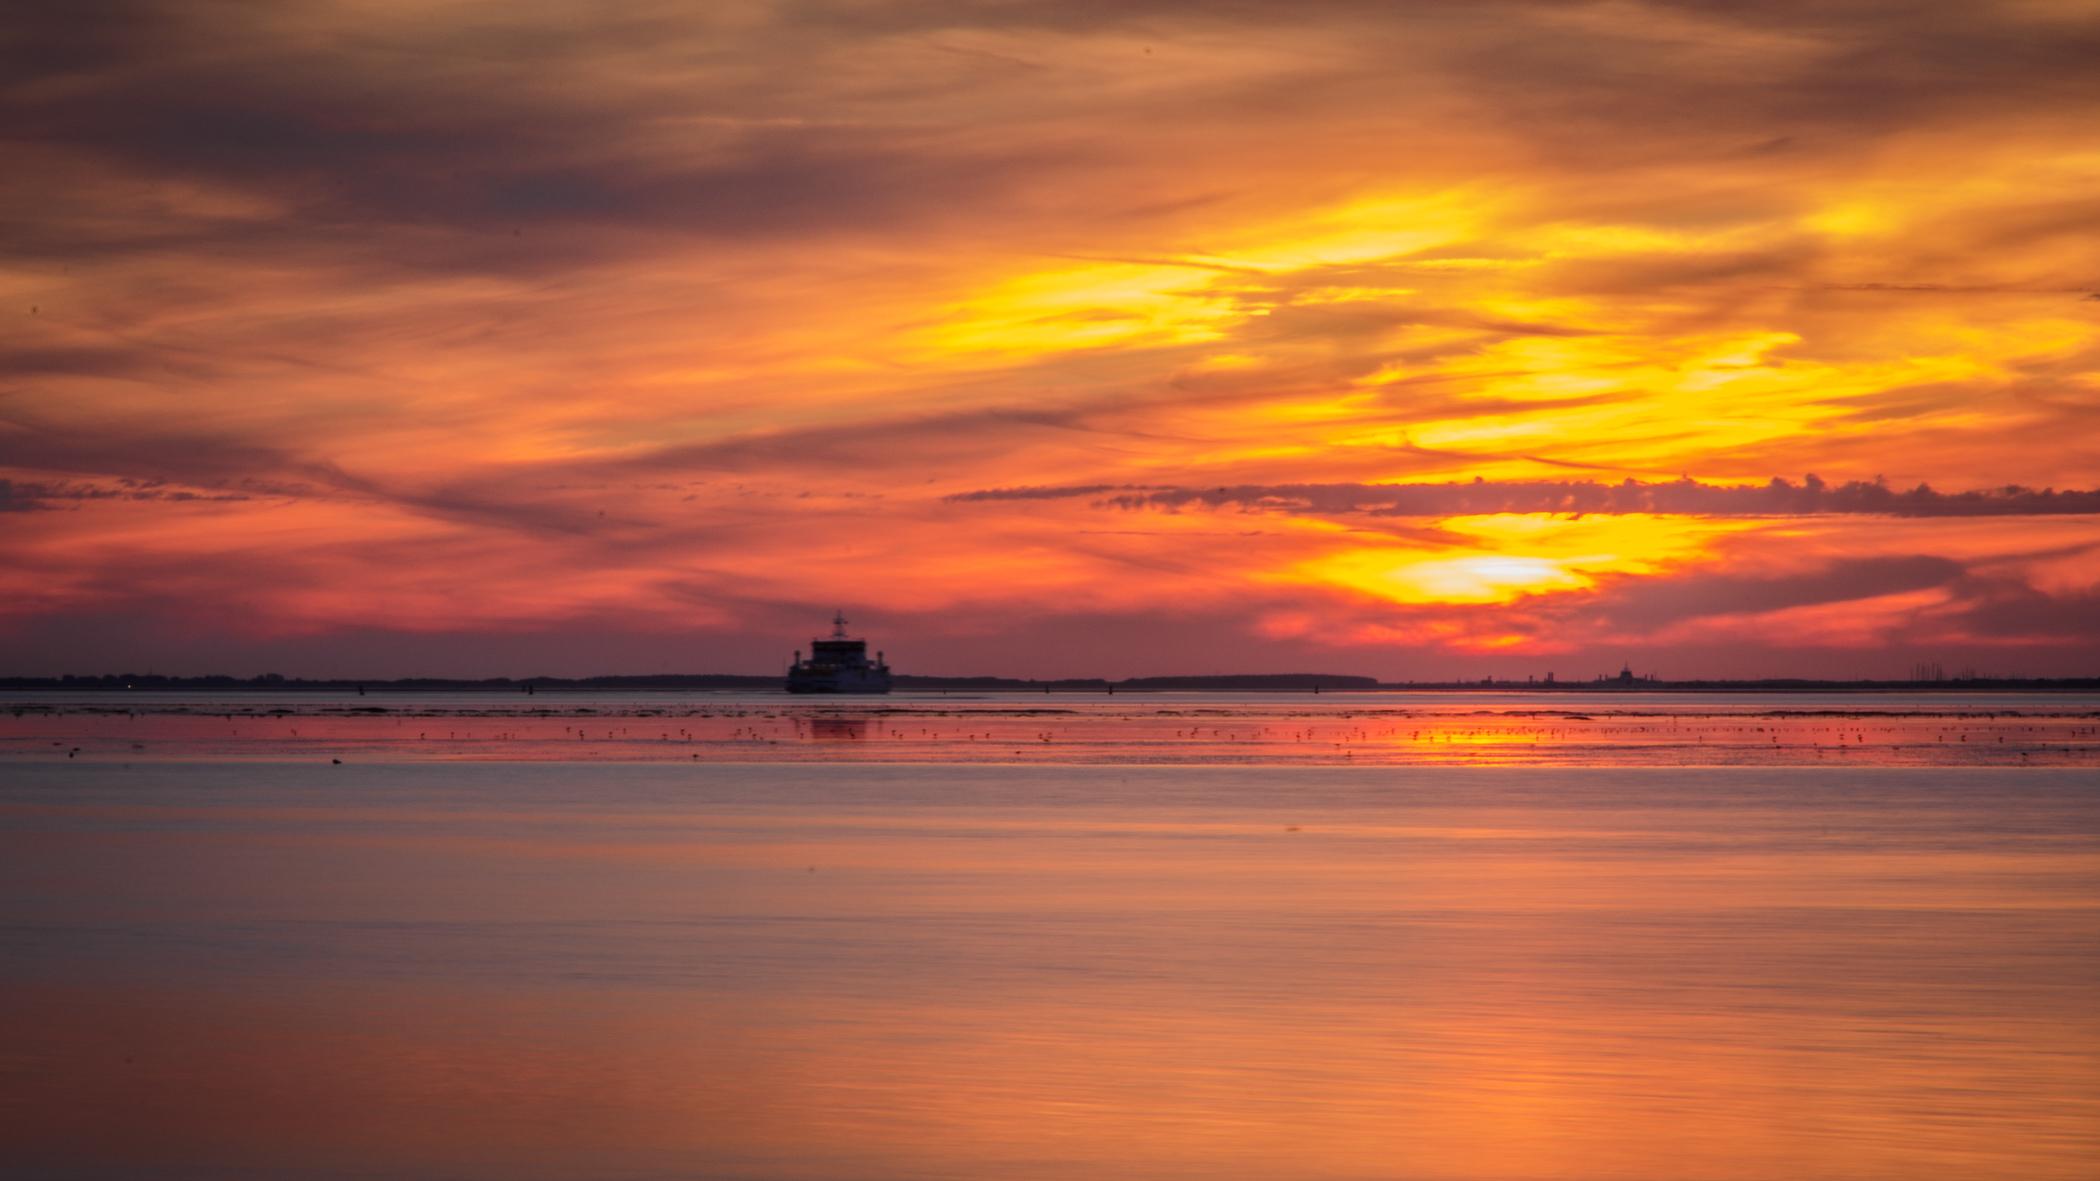 Sunset – Sunrise